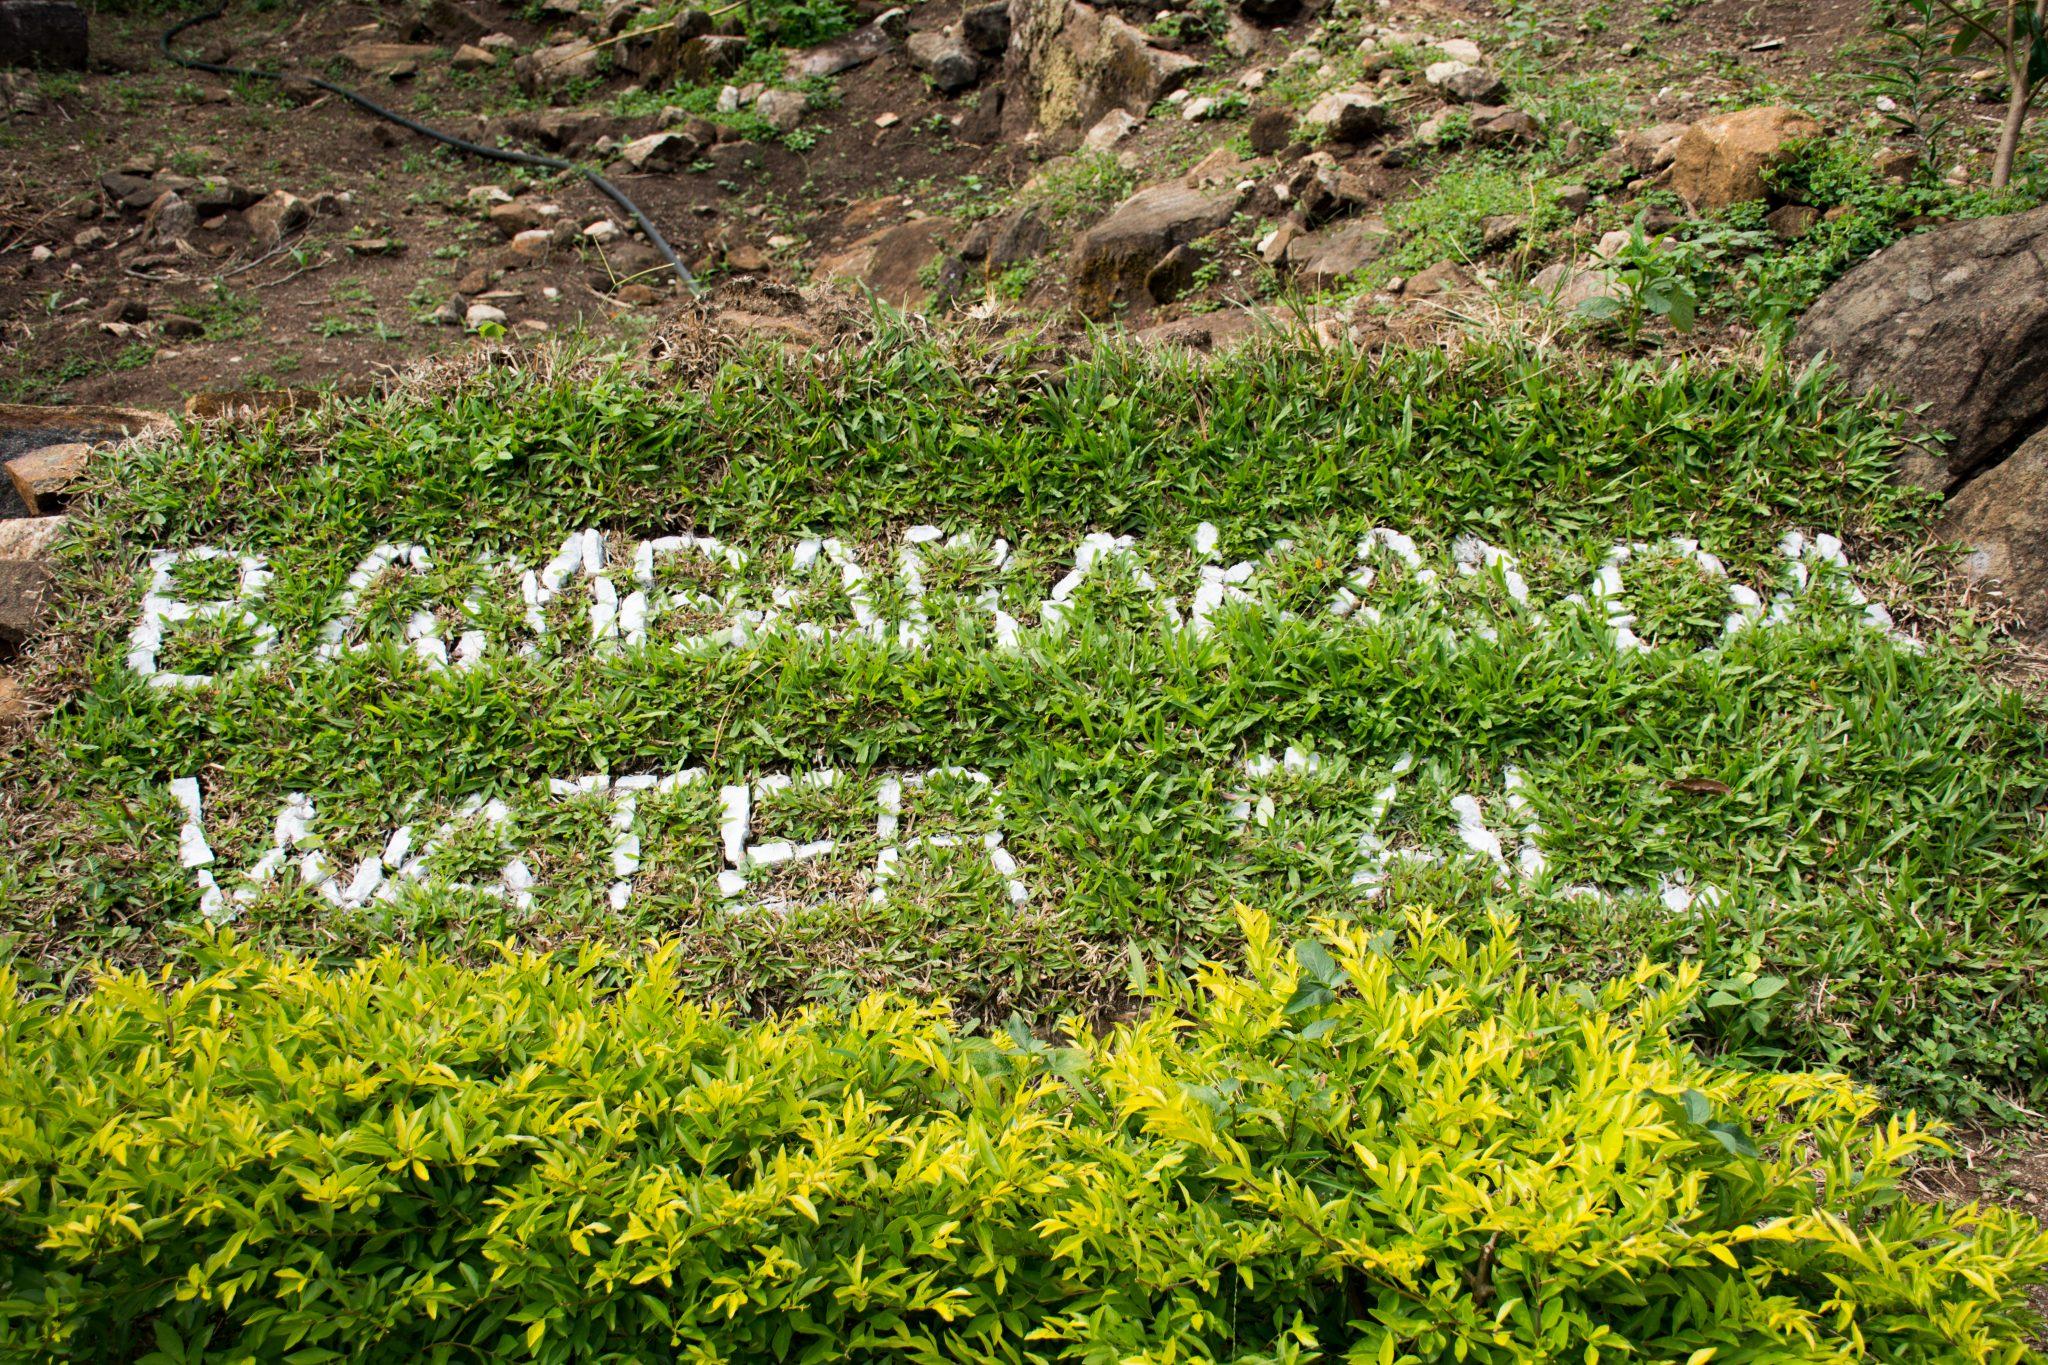 Sign on Grass